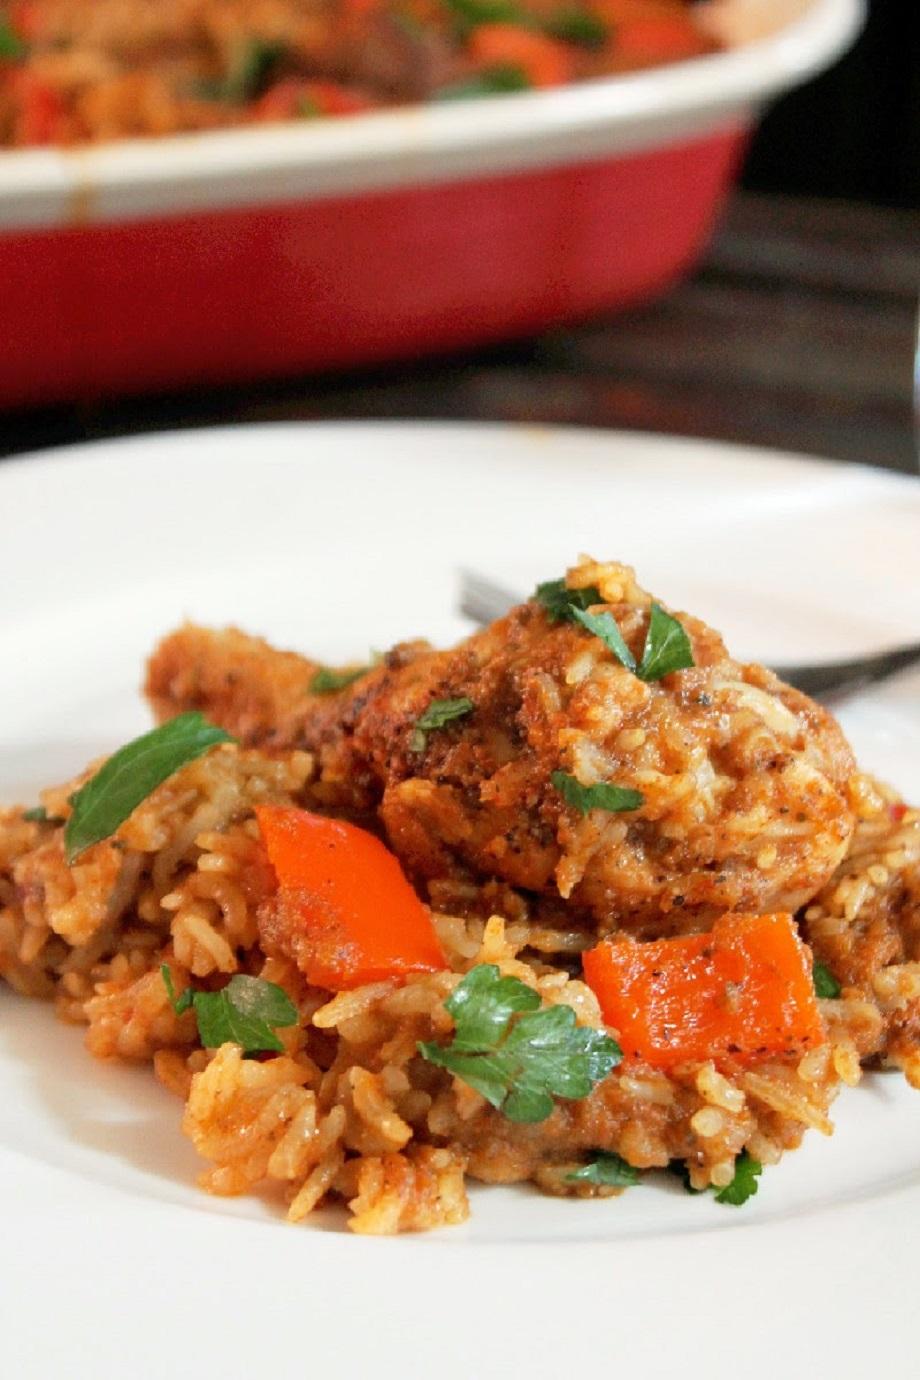 wparroz con pollo (chicken with rice) (7)